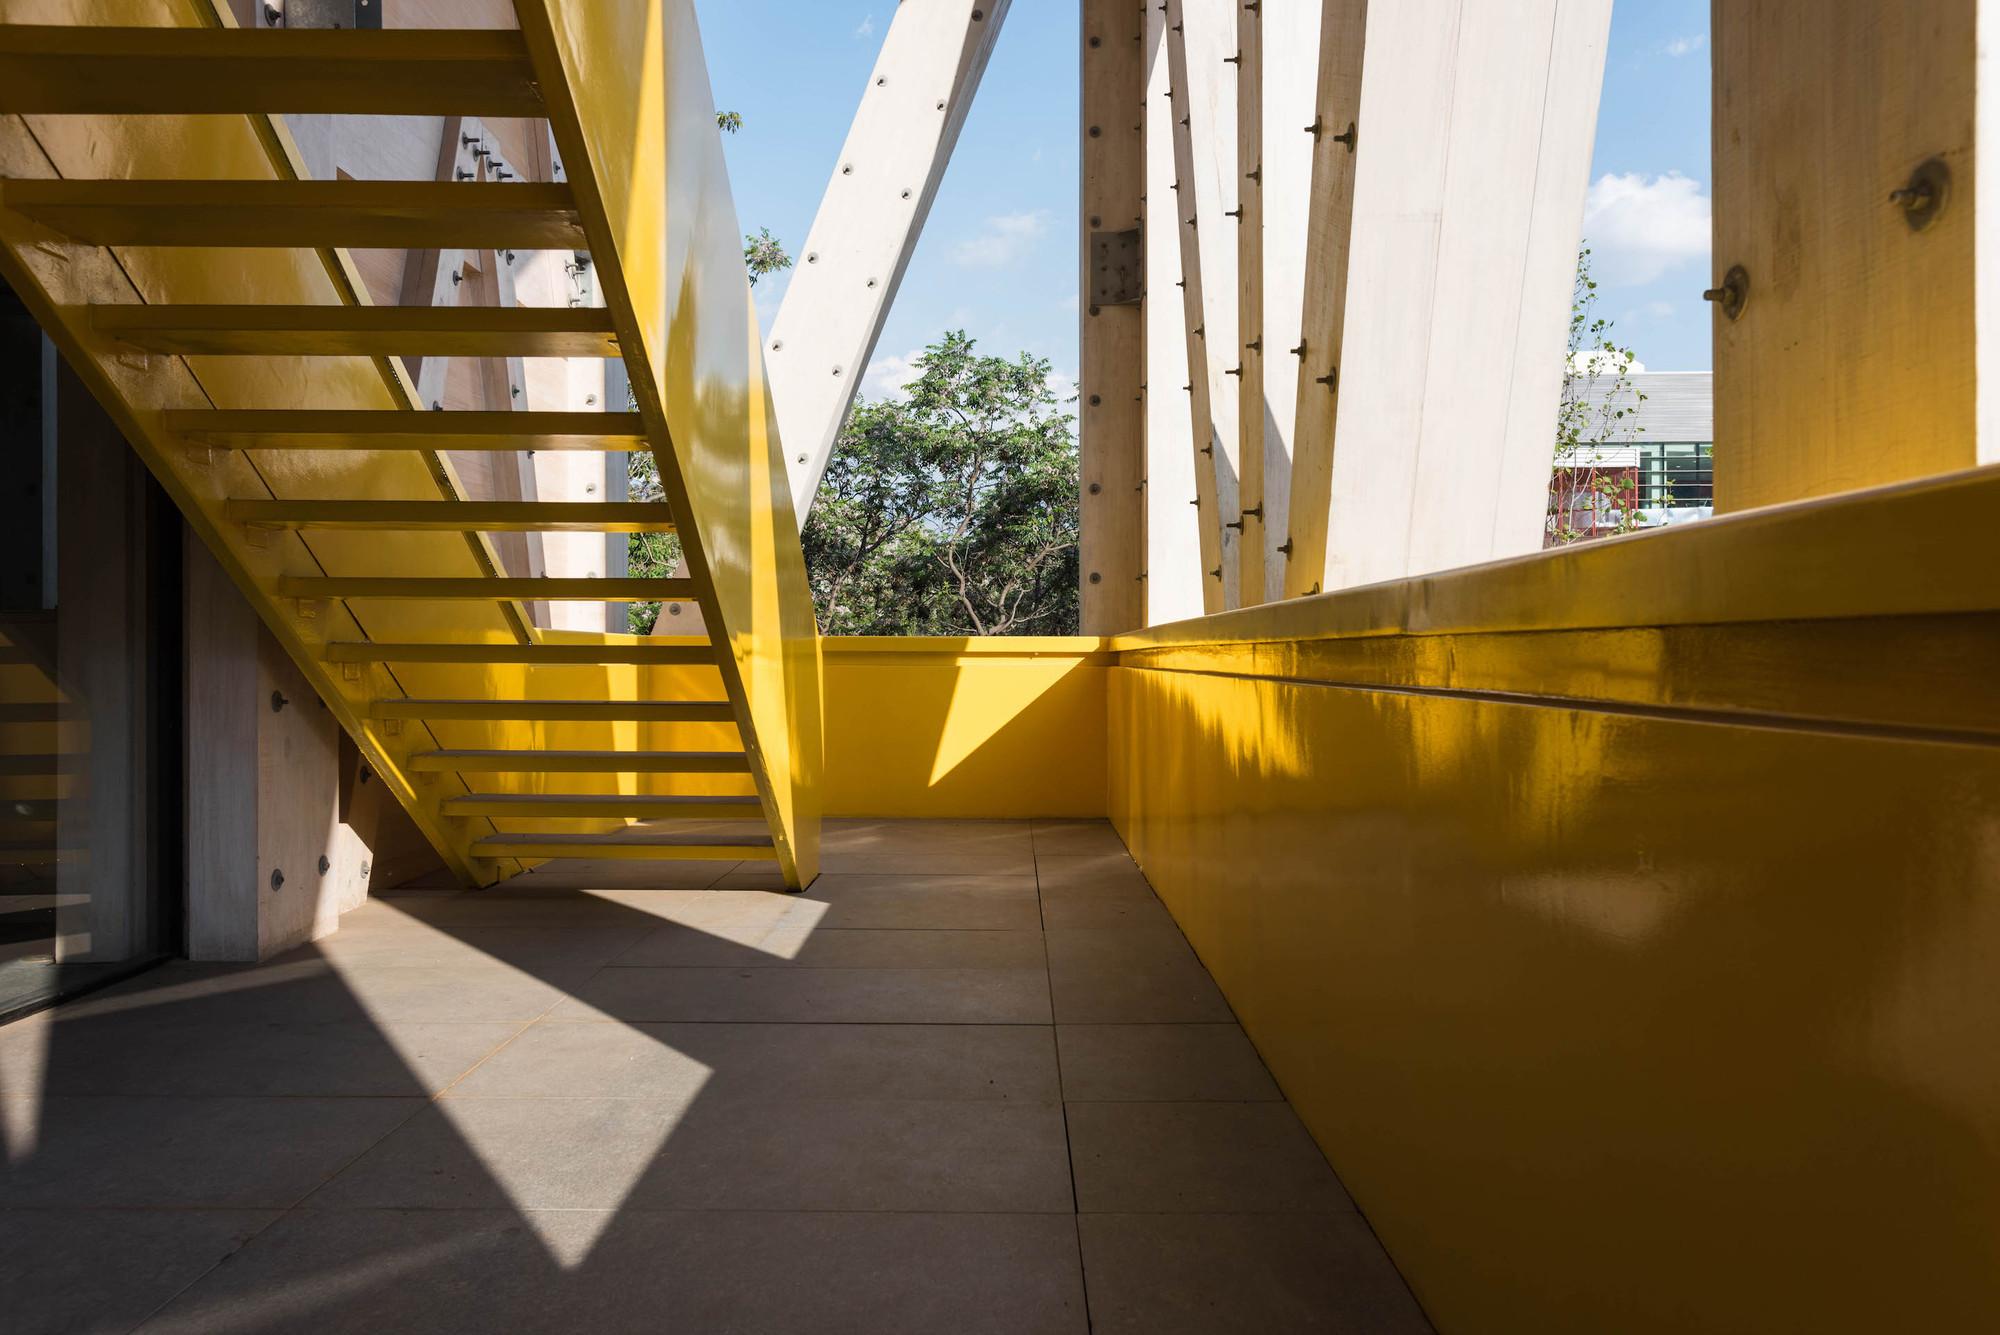 Delicieux UC Architecture School Building / Gonzalo Claro